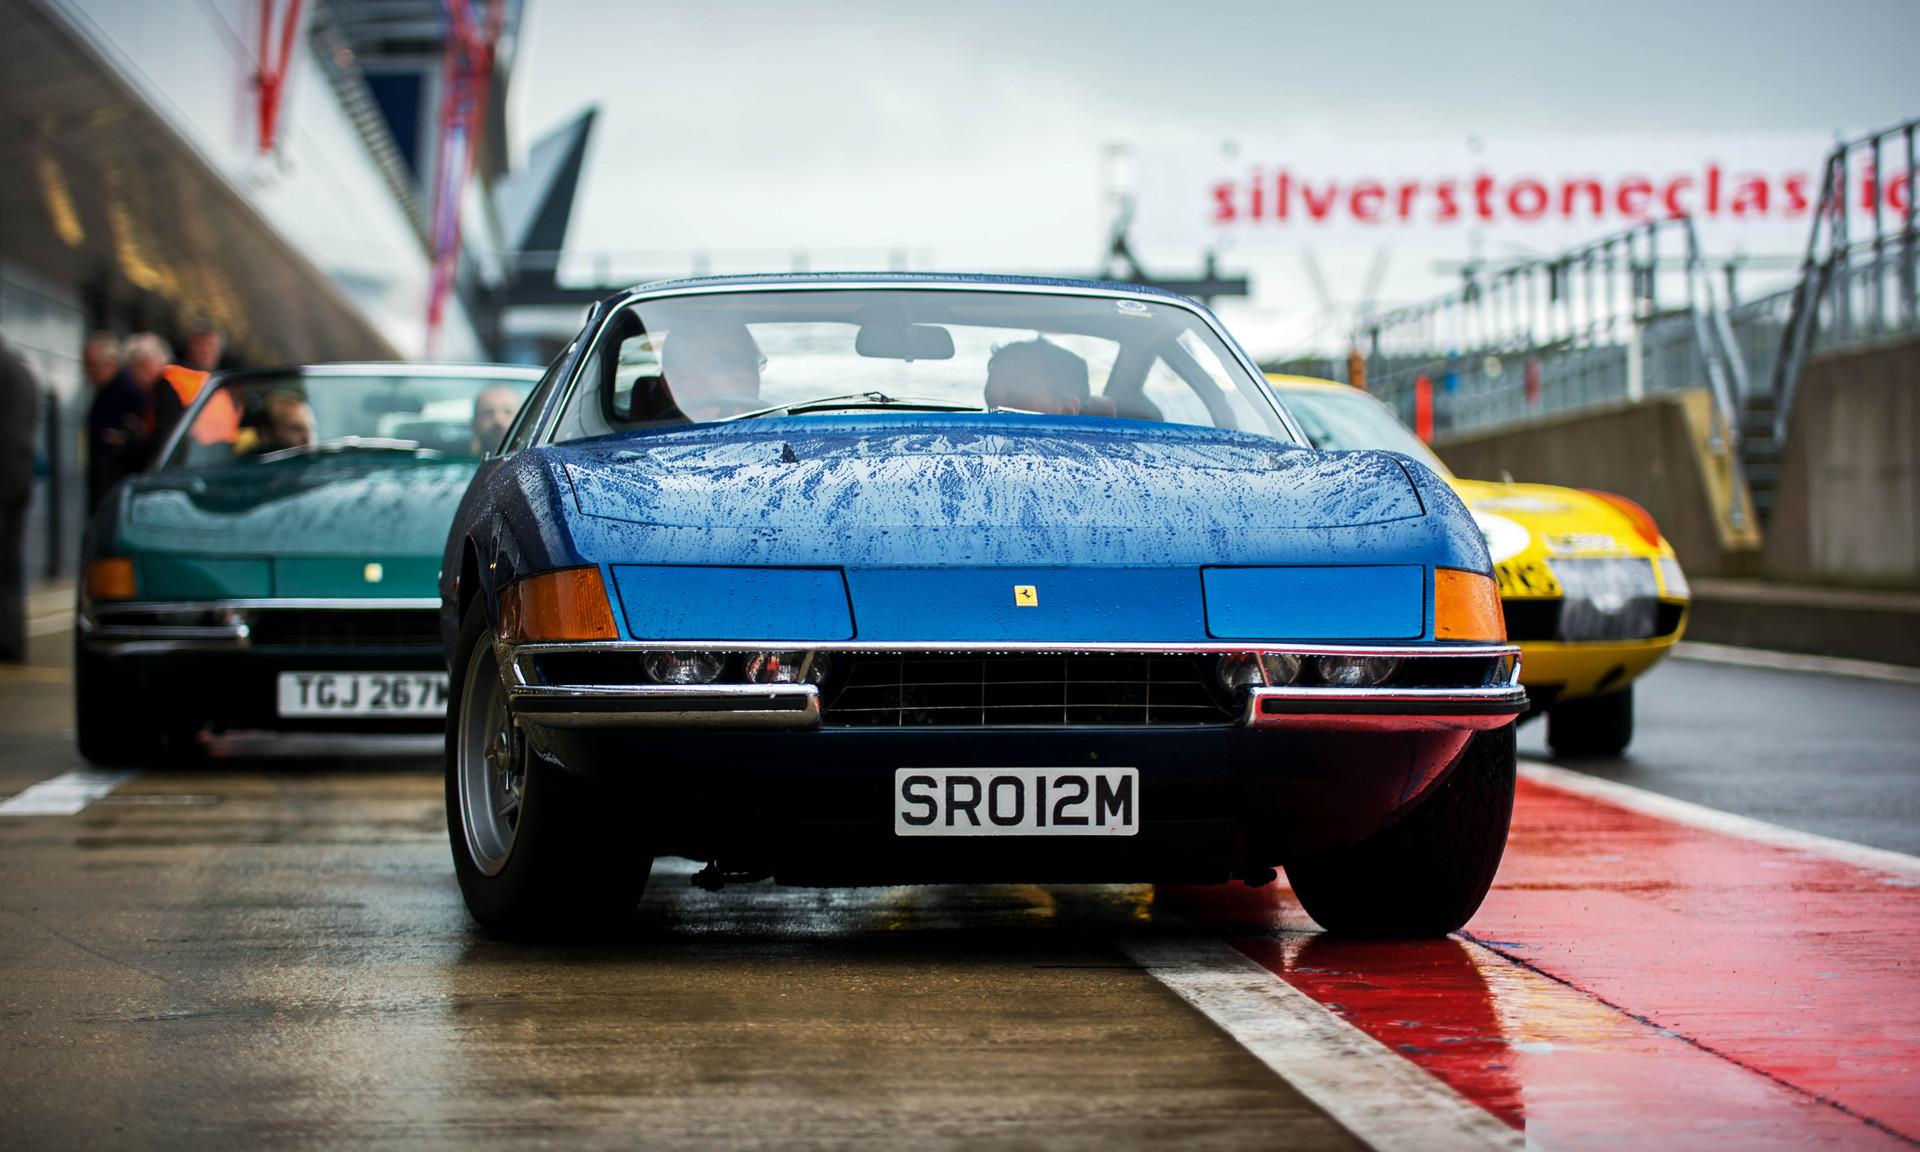 Trio of Ferrari 365 GTB 4 Daytonas at the 2018 Silverstone Classic Preview Day